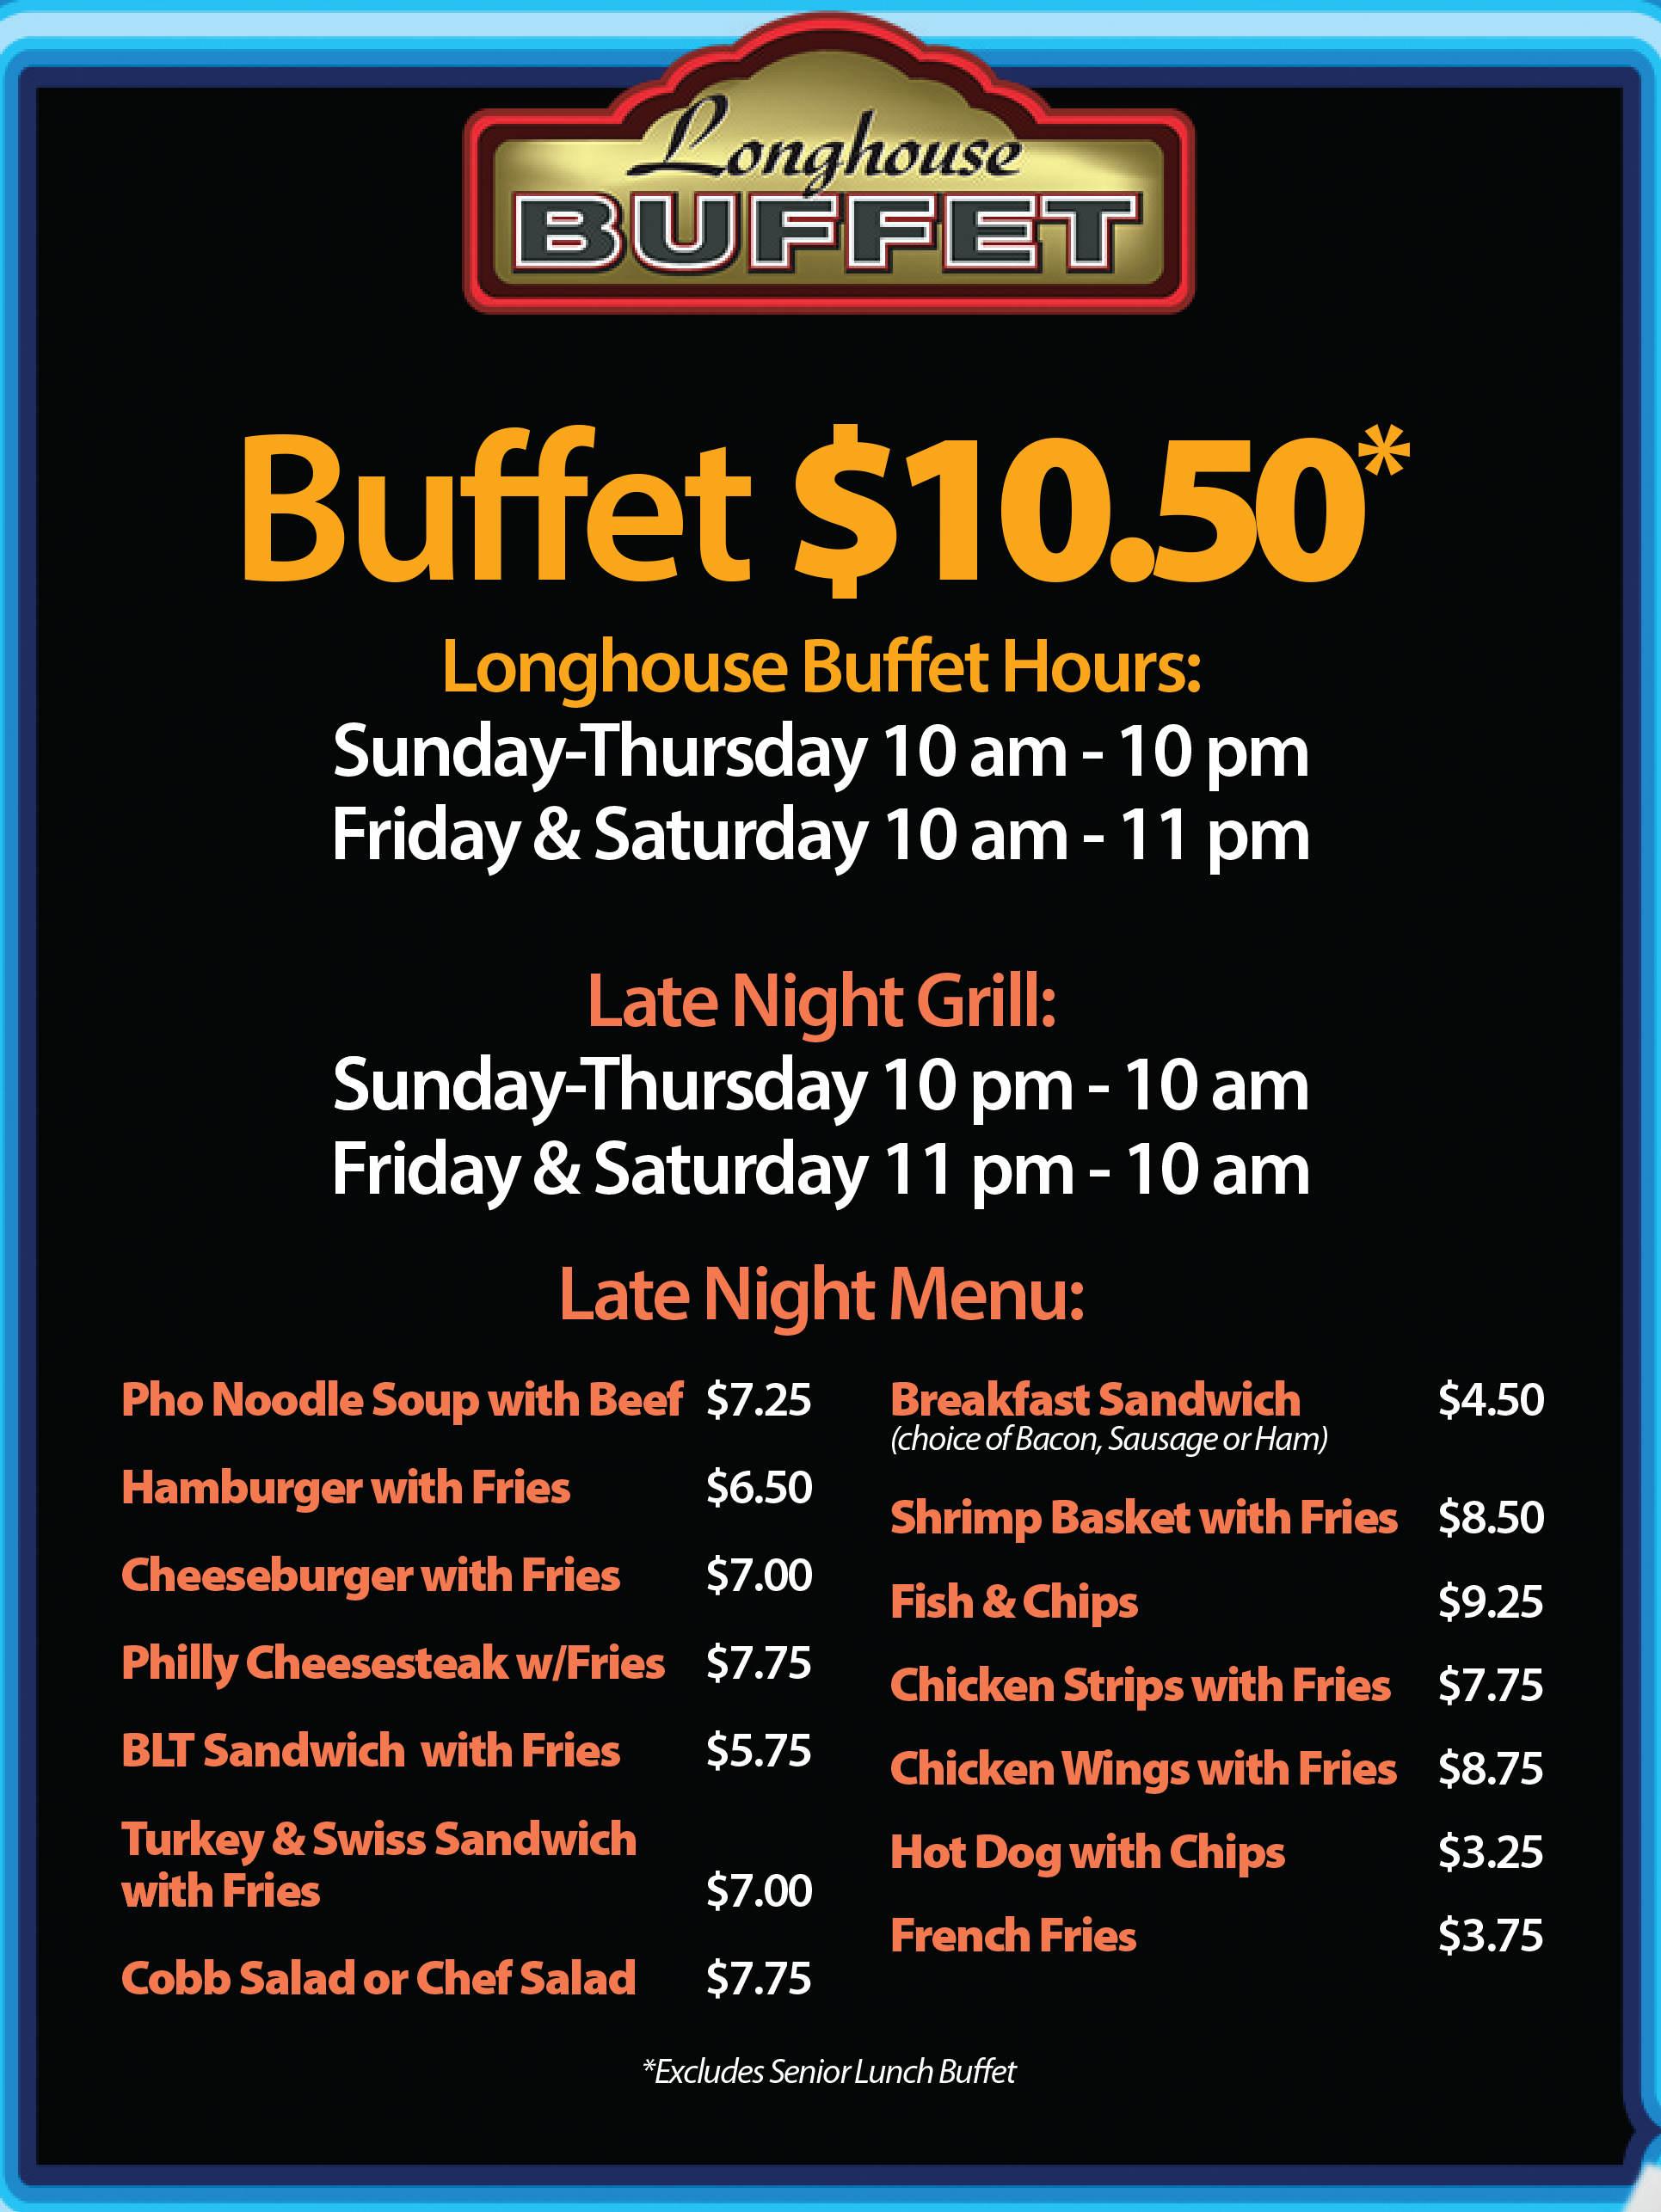 Clearwater casino lunch buffet